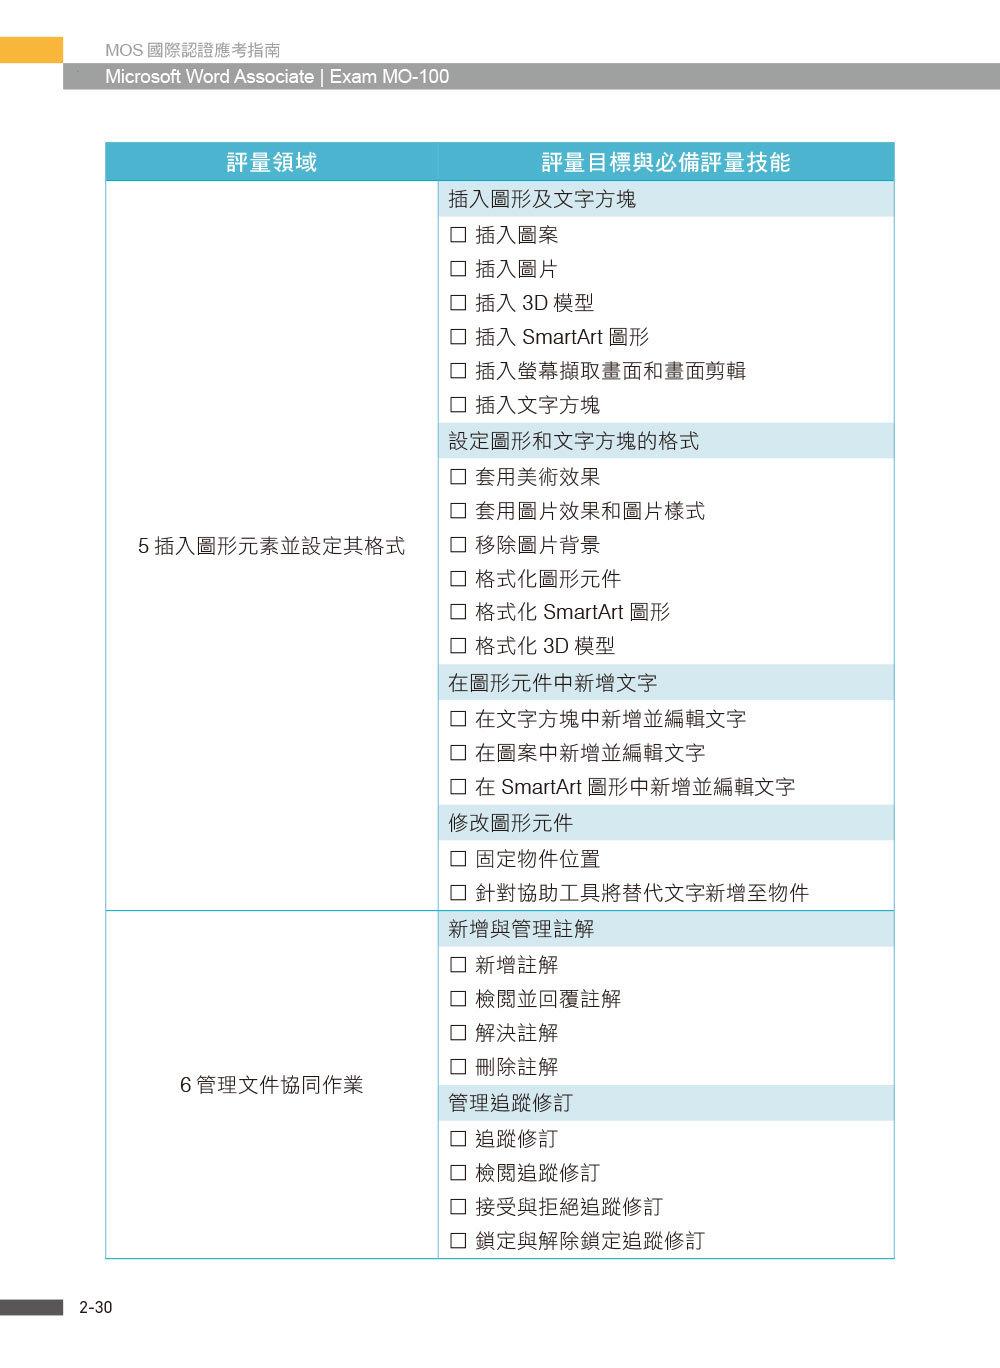 MOS 國際認證應考指南 -- Microsoft Word Associate|Exam MO-100-preview-5